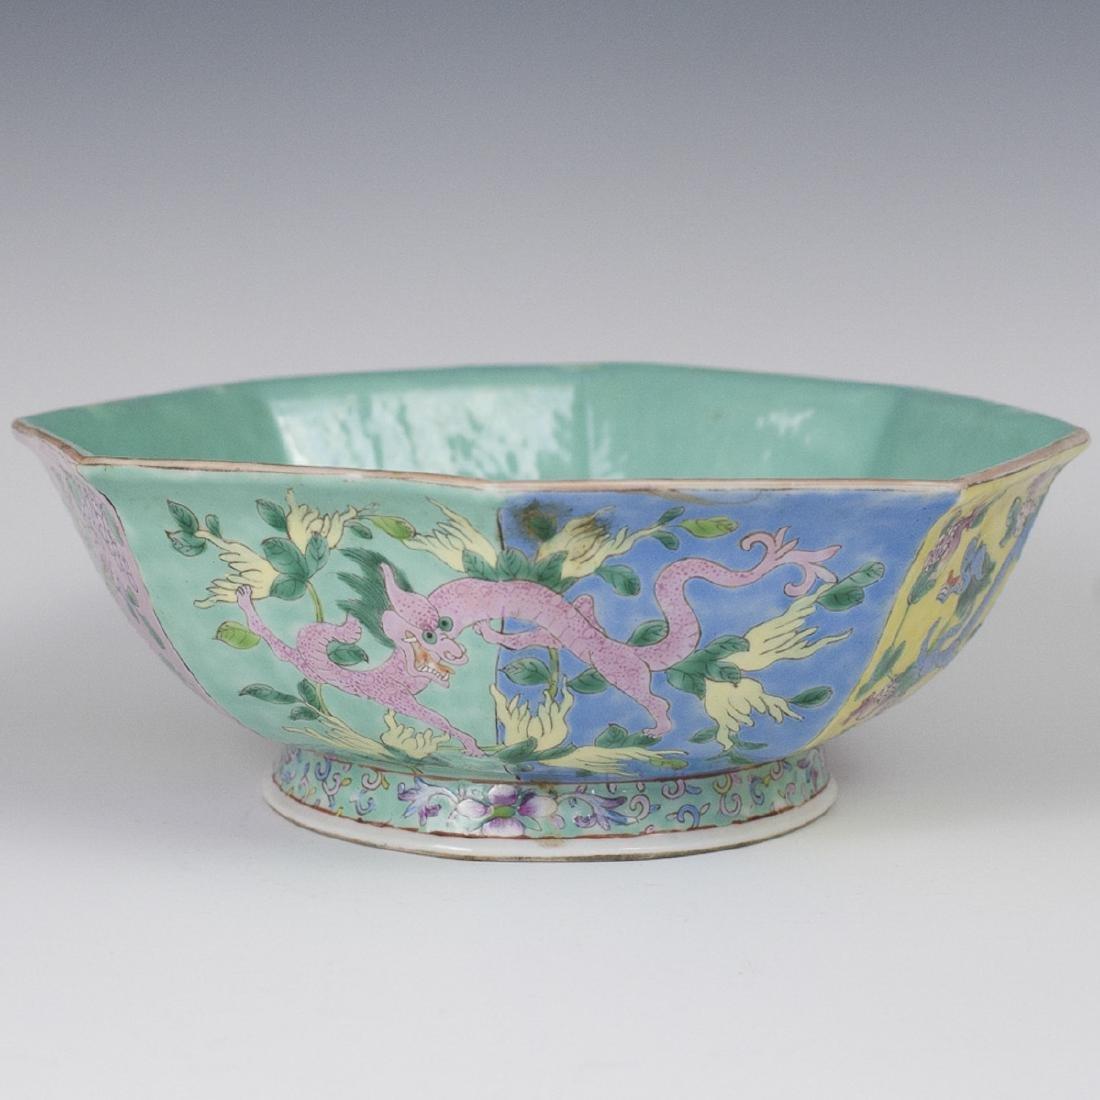 Antique Chinese Famille Rose Enameled Porcelain Bowl